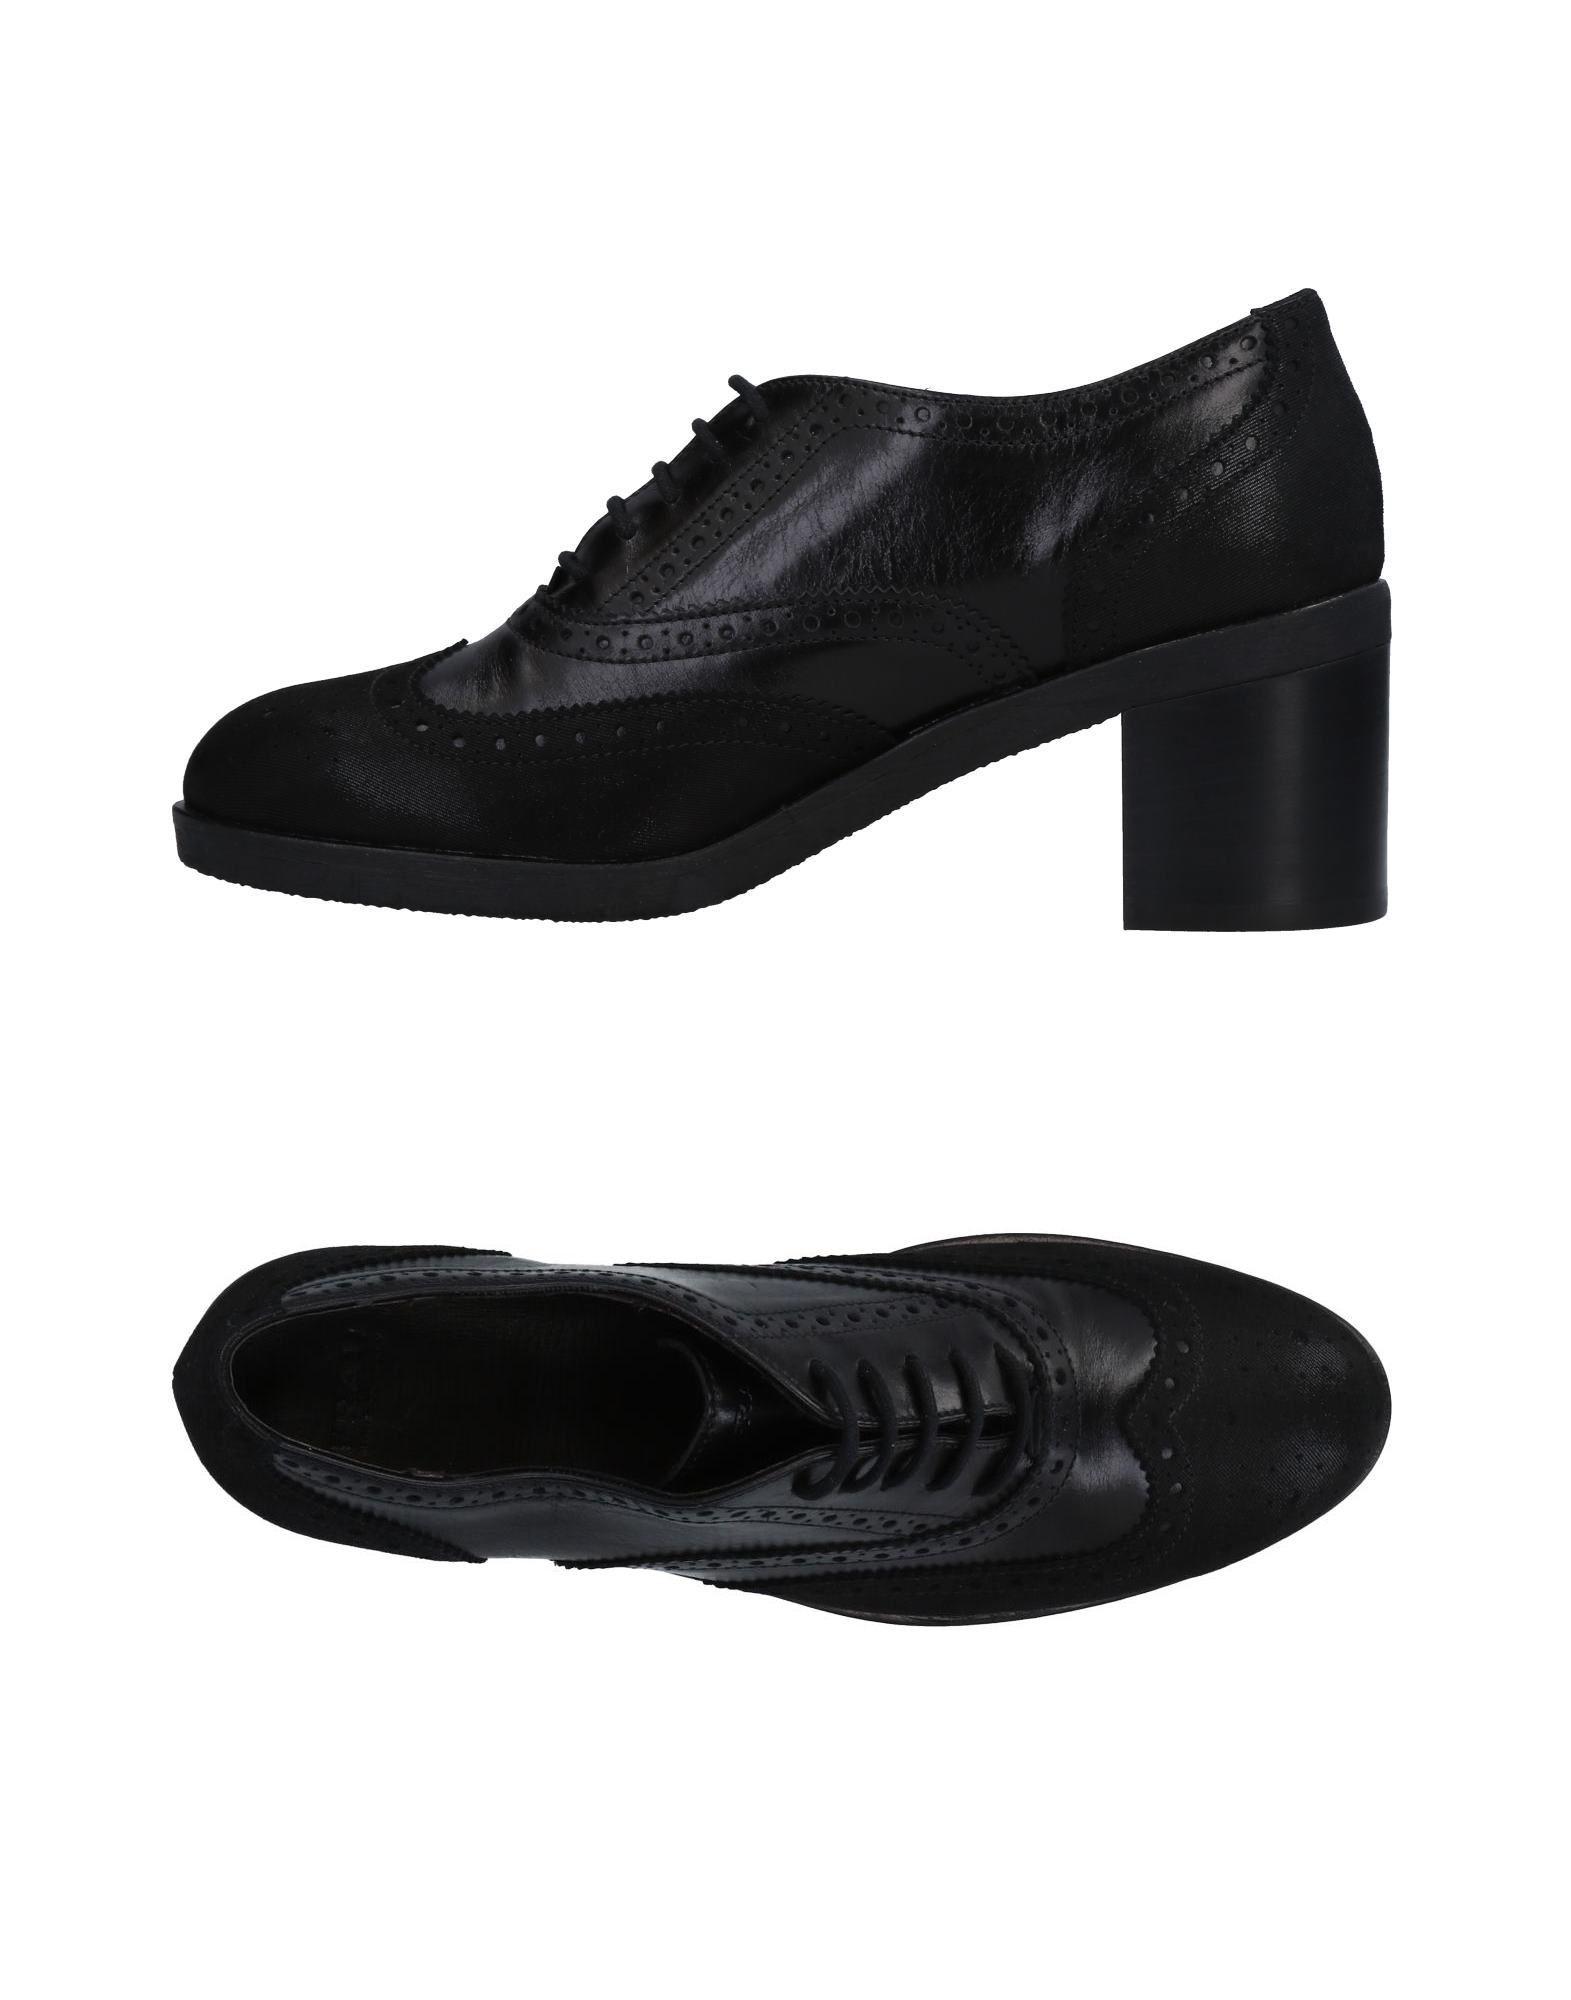 Frau Schnürschuhe Damen  11480787TD Gute Qualität beliebte Schuhe